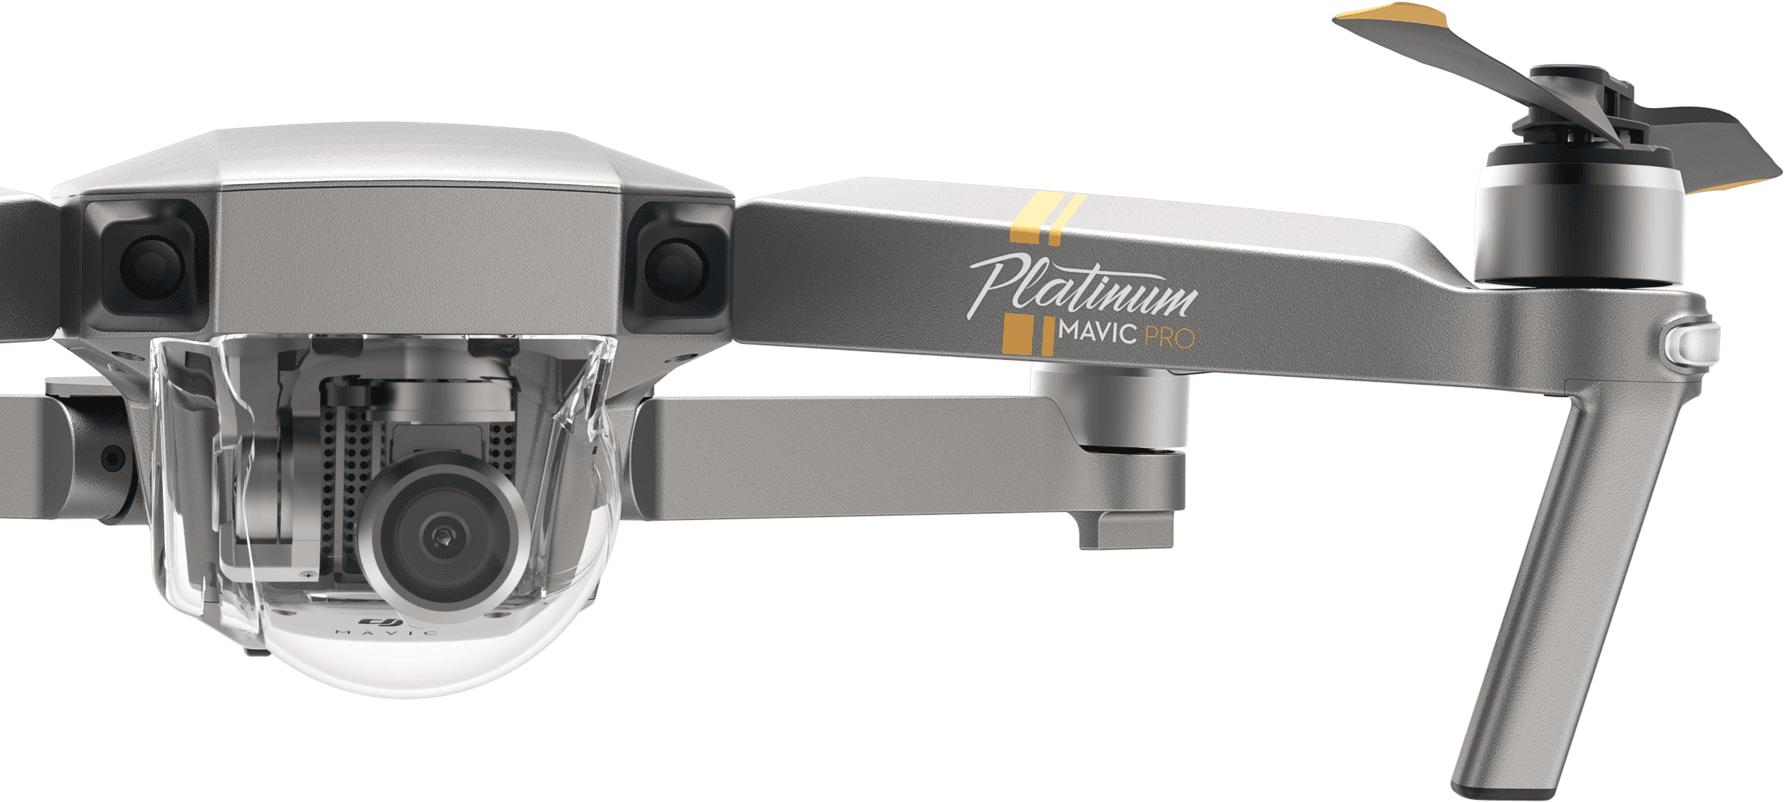 https://eshop.pro-drony.cz/products/archiv/text/Mavic_Pro-Fly-Combo-Platinum.png